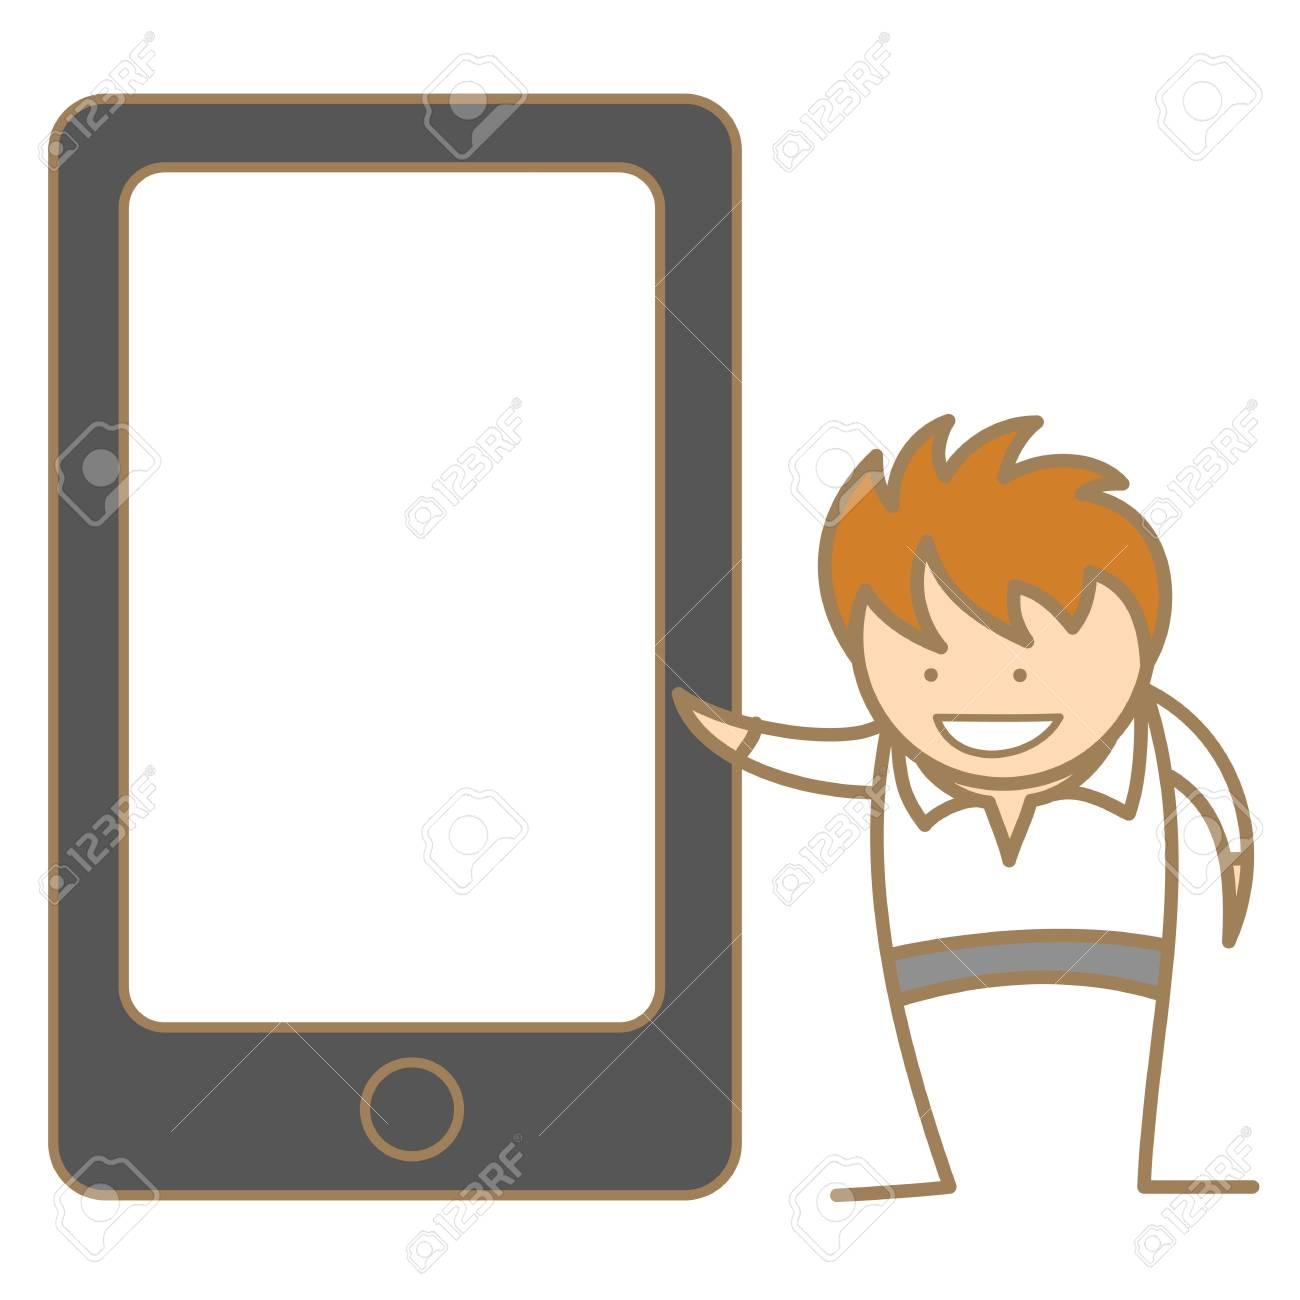 cartoon character of man presenting via cell phone Stock Vector - 17409847